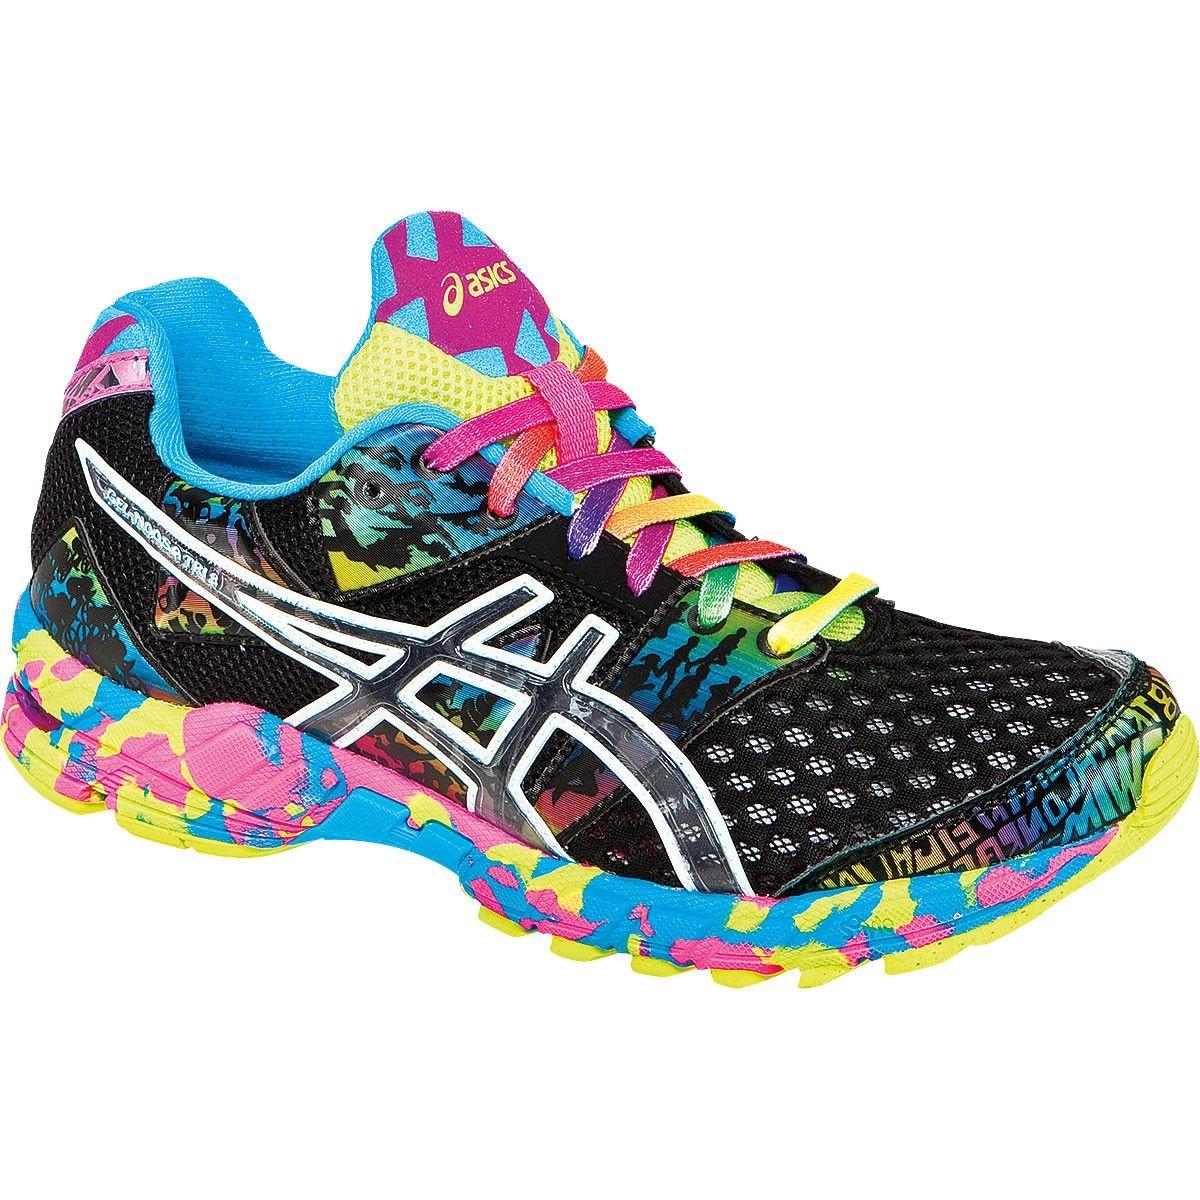 Zapatos Tenis Asics Nuevos Modelos